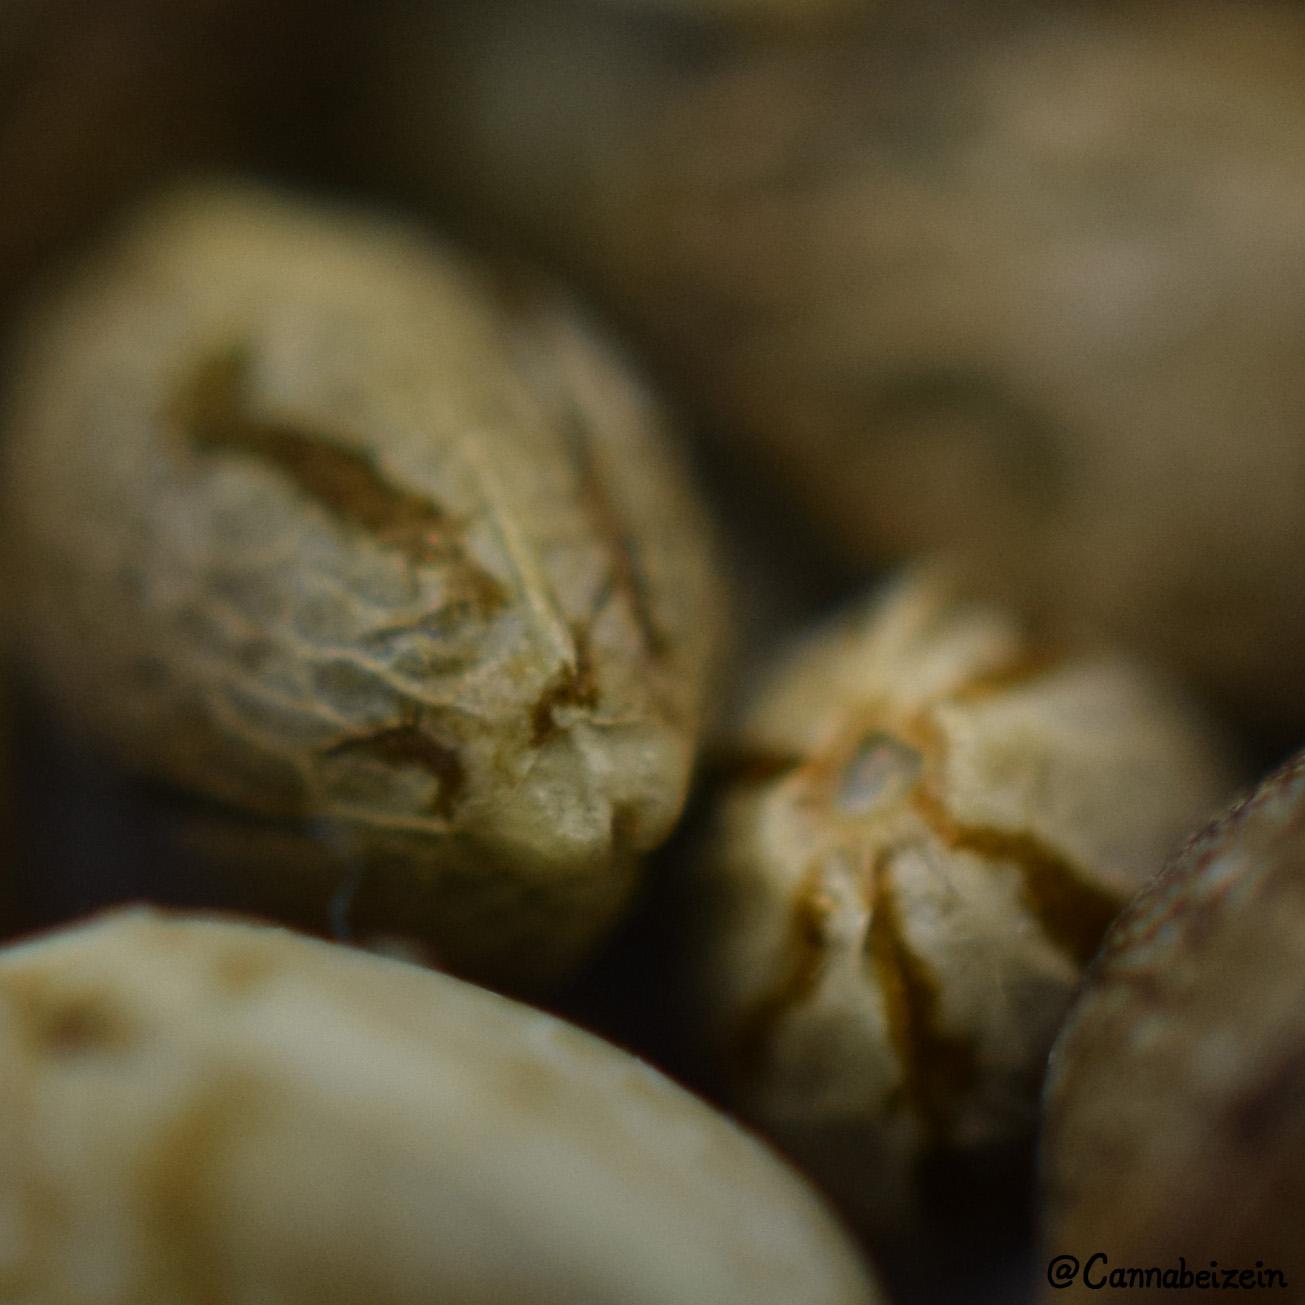 Cannabeizein 0224 - Mystery Mix Seeds - DSC_0839 copy.jpg